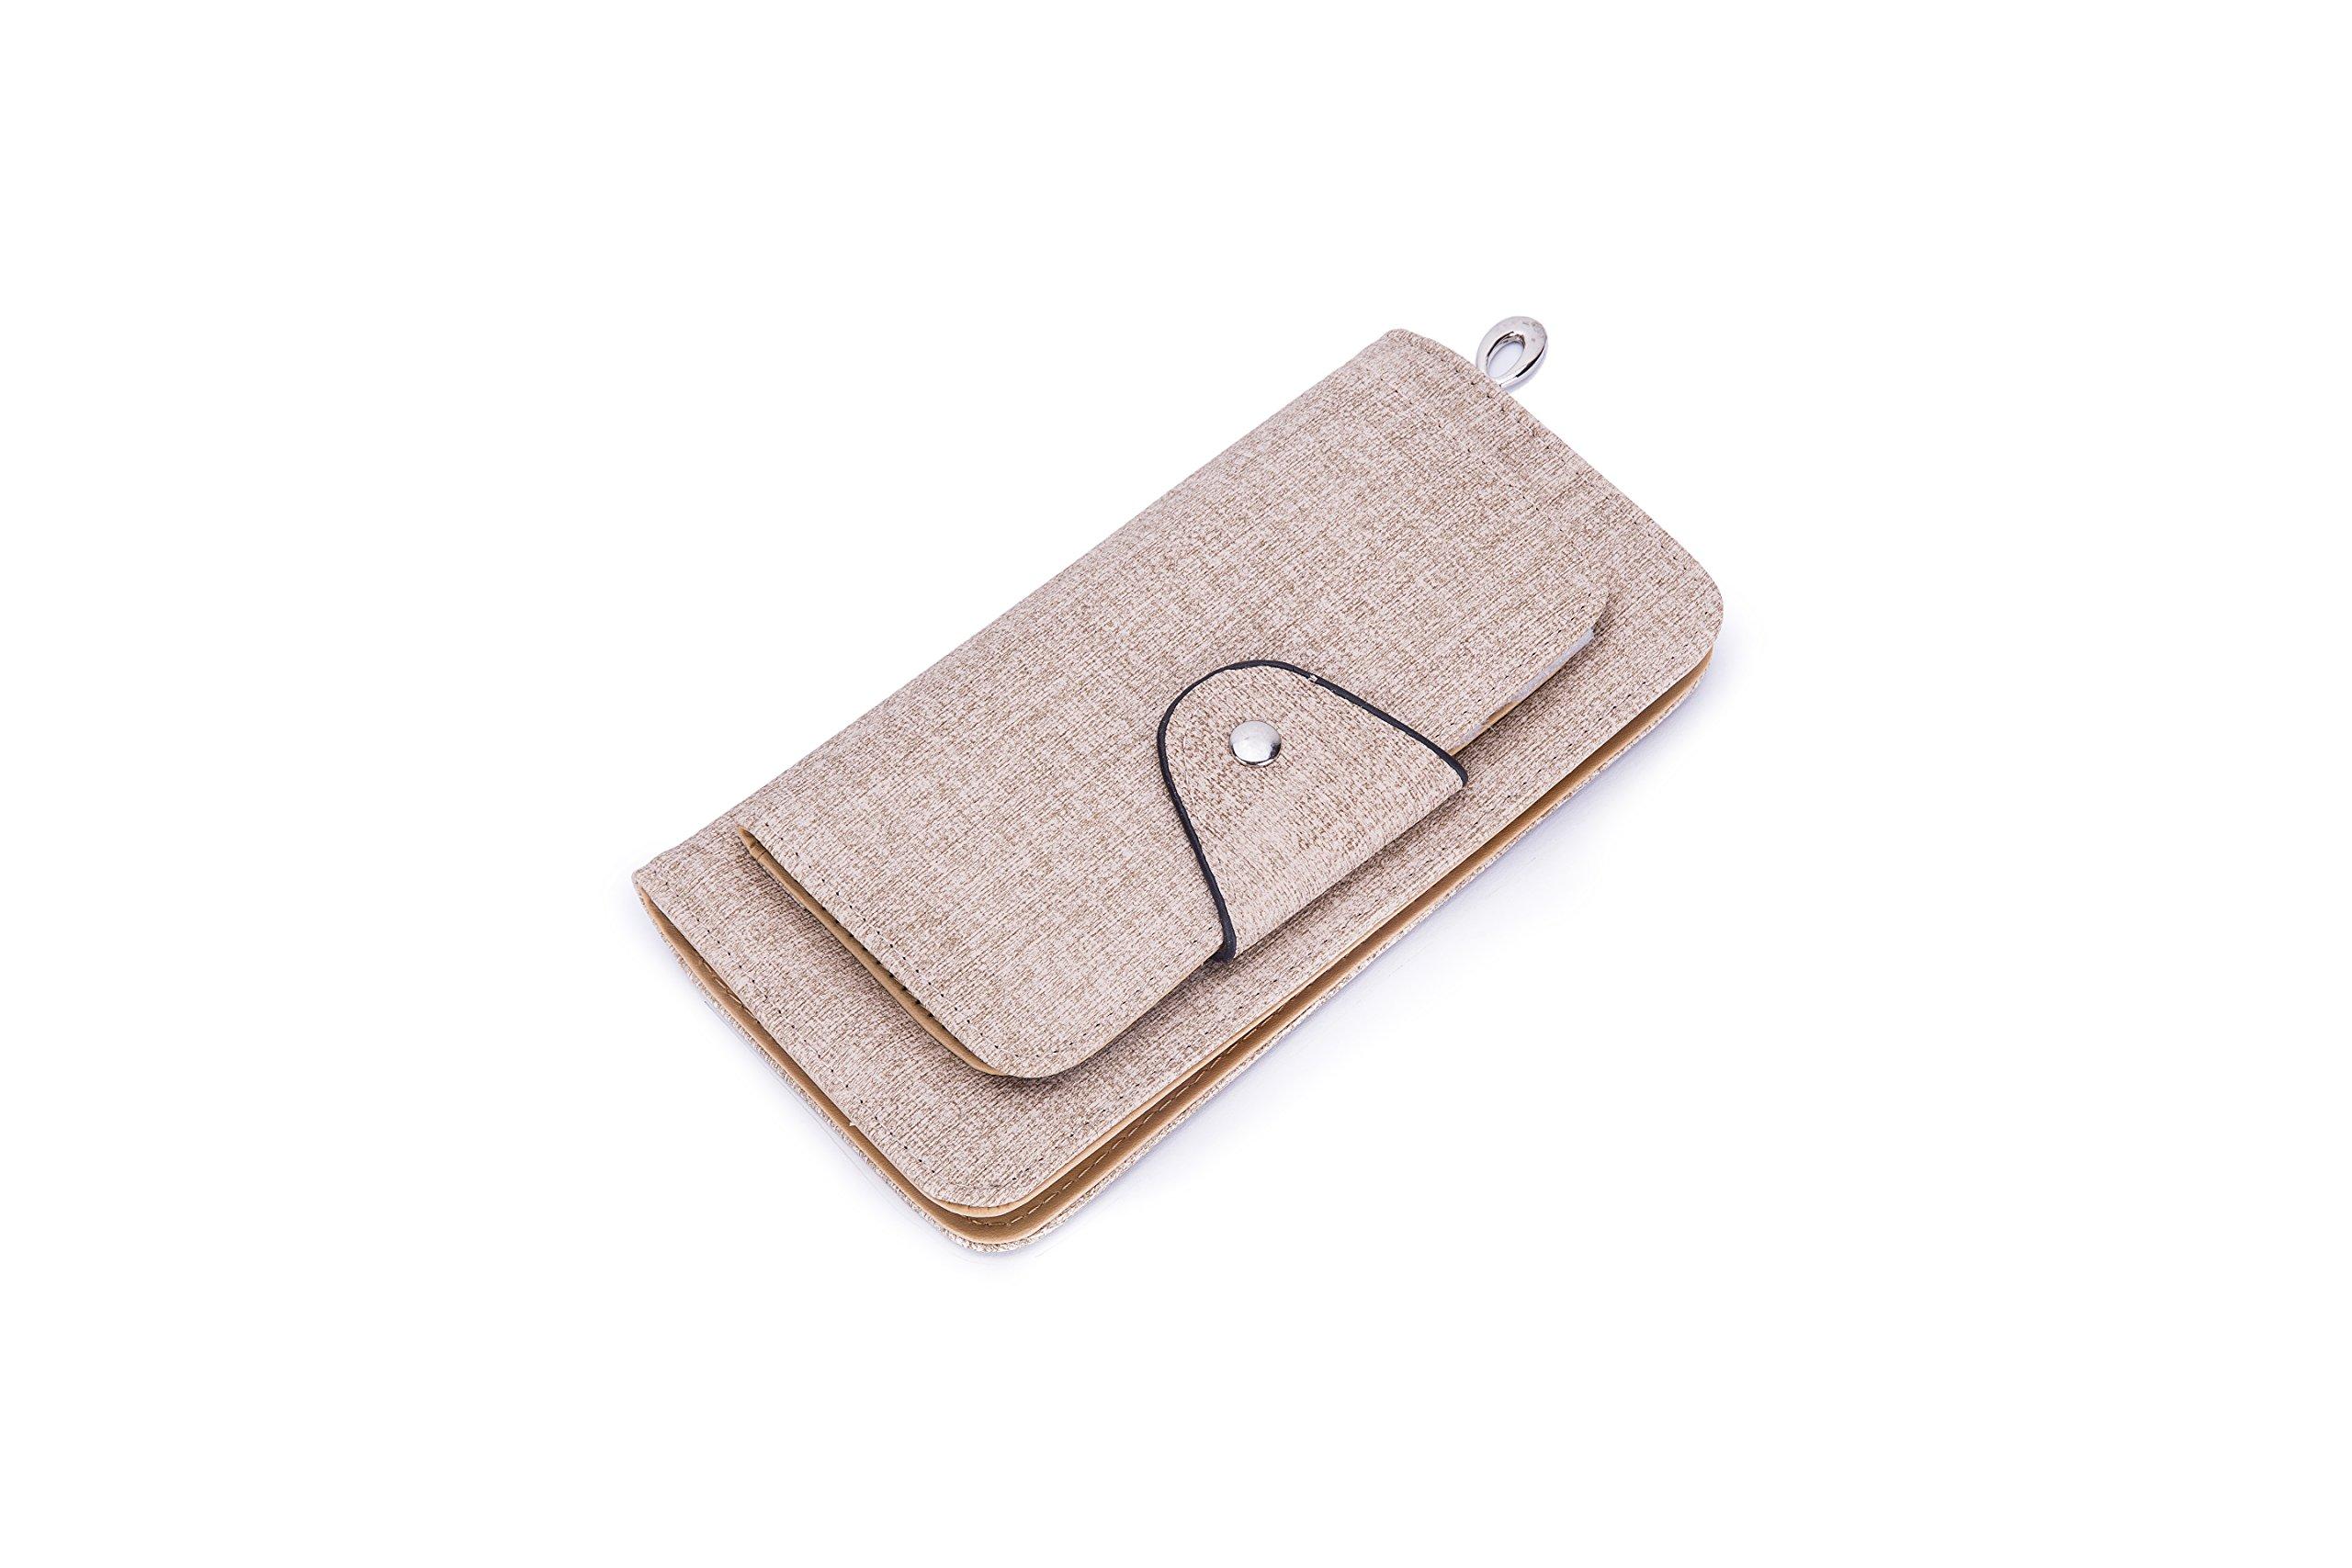 GLITZALL Women's Short Leather Card Holder Purse Zipper Buckle Elegant Clutch Wallet (Style-2 Apricot)